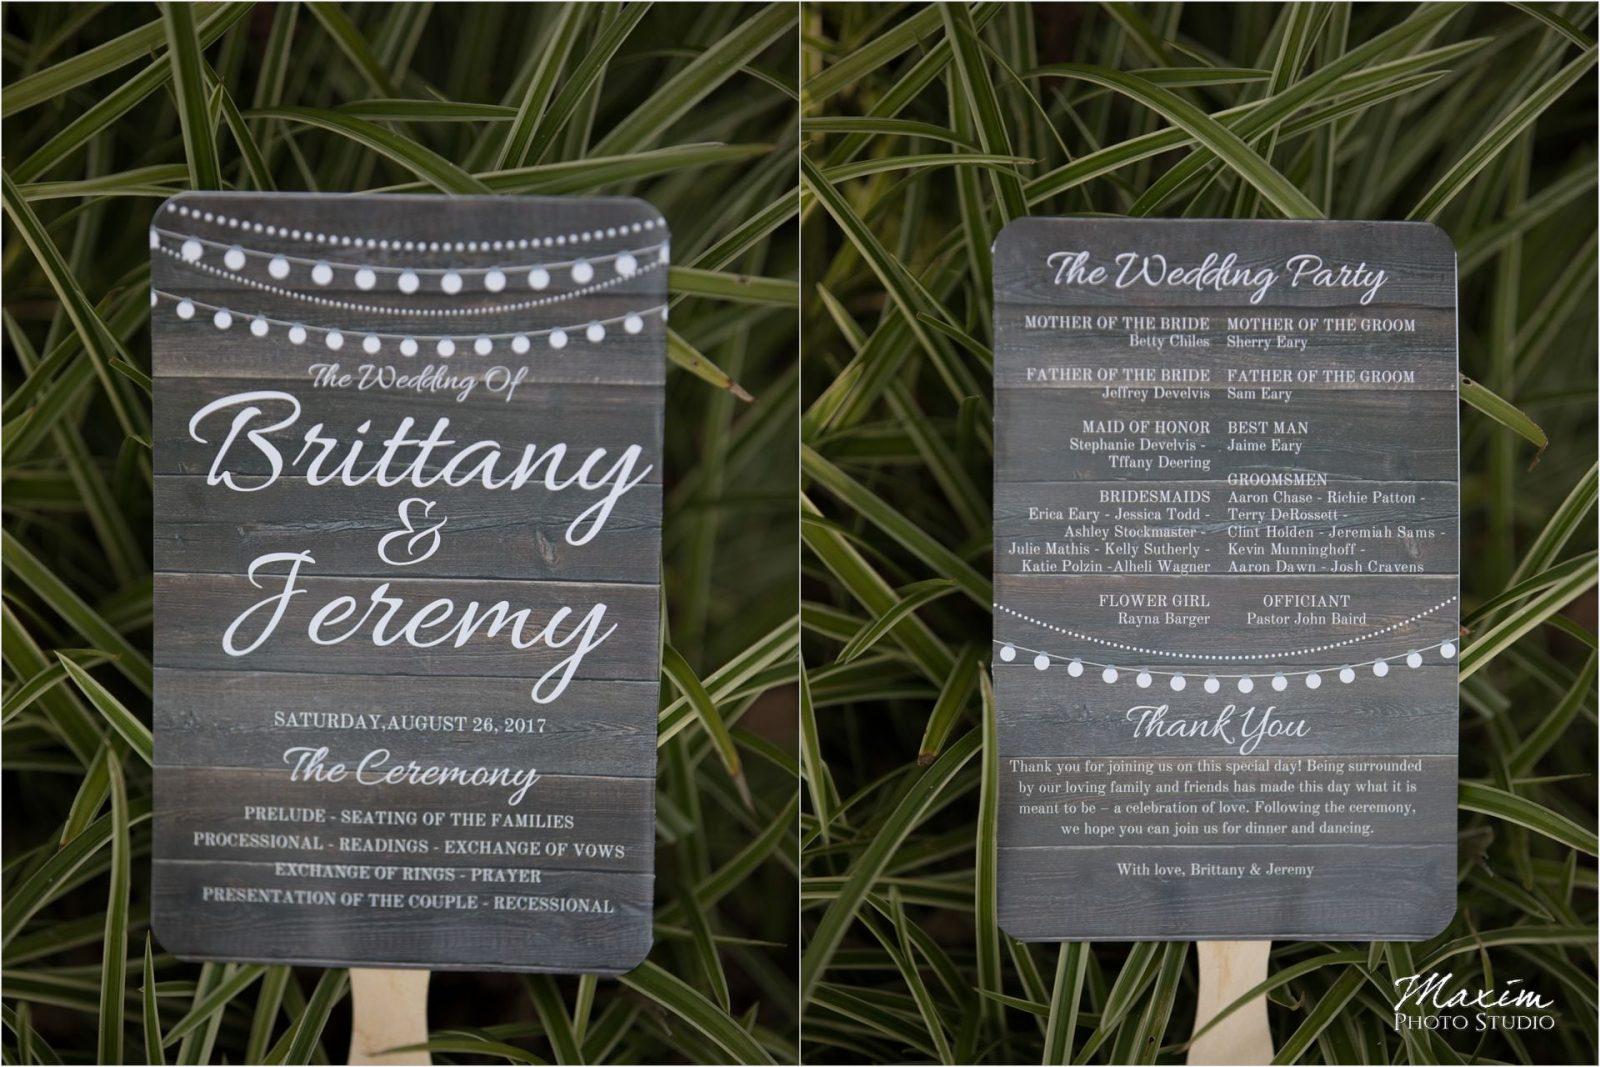 Pattison Park Lodge Wedding Ceremony